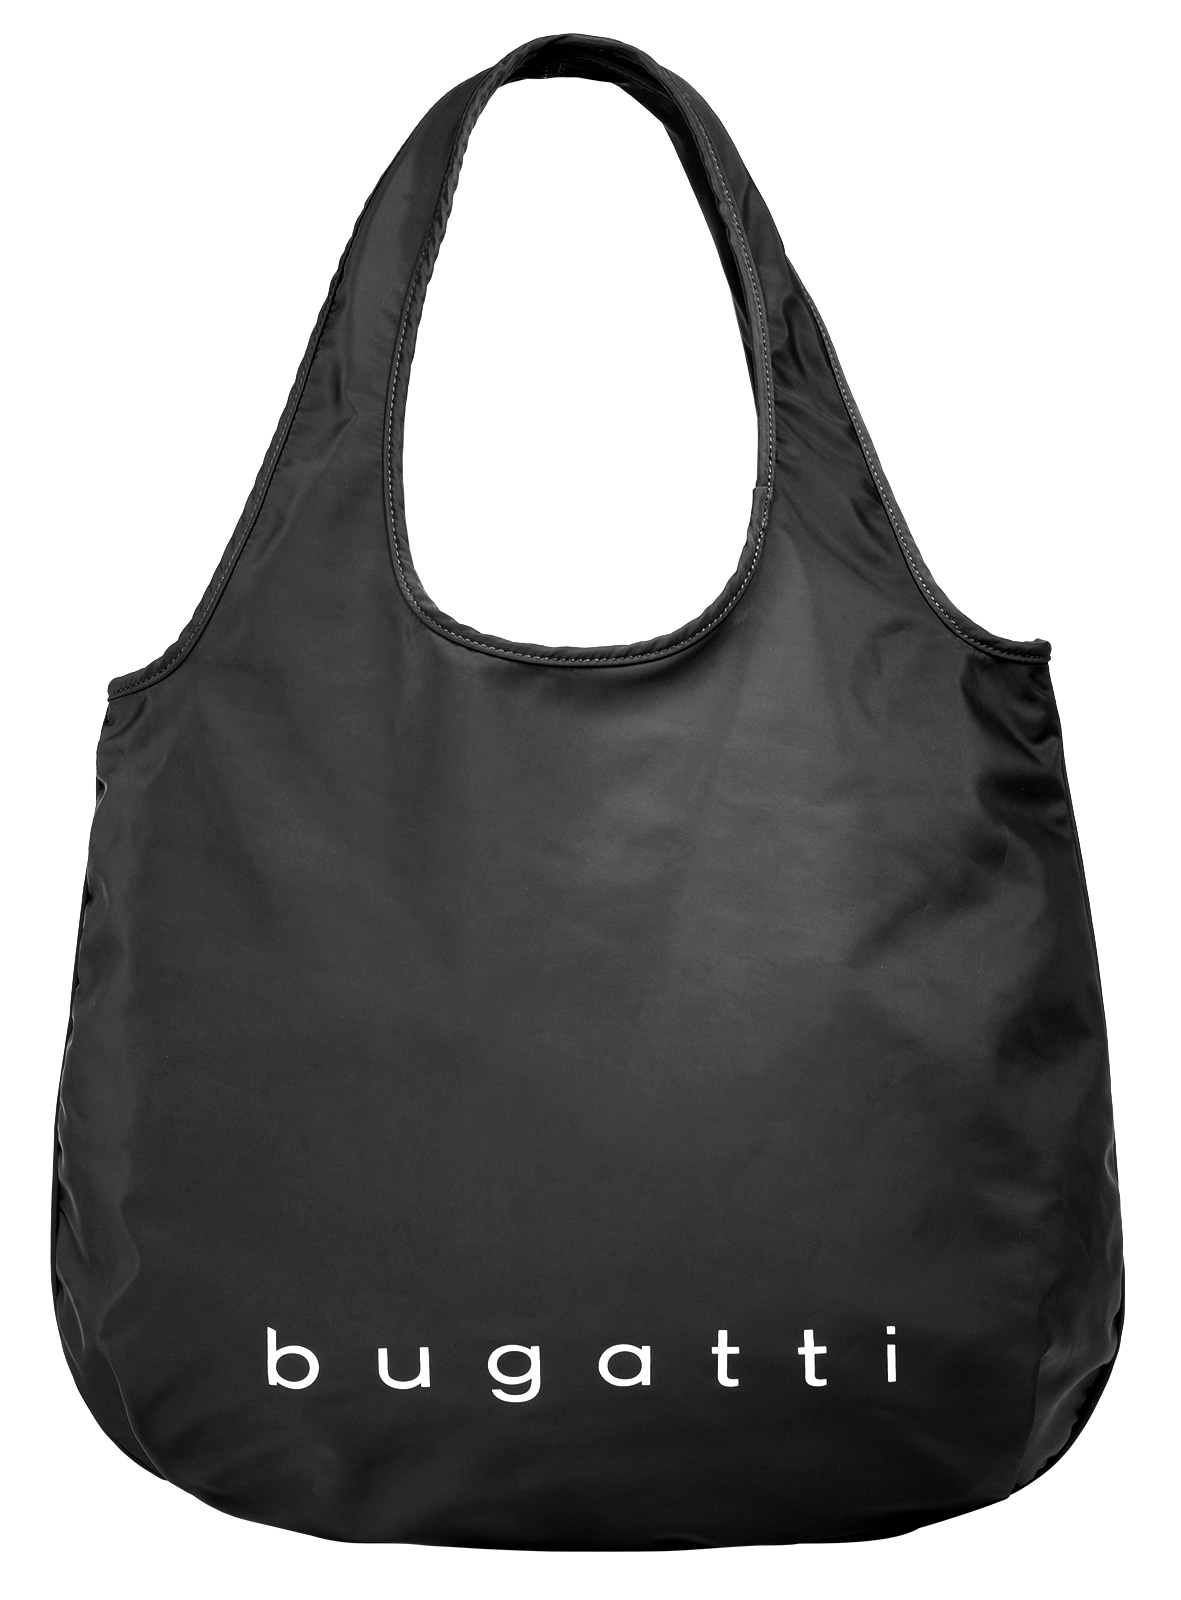 bugatti -  Shopper BONA, besonders leicht